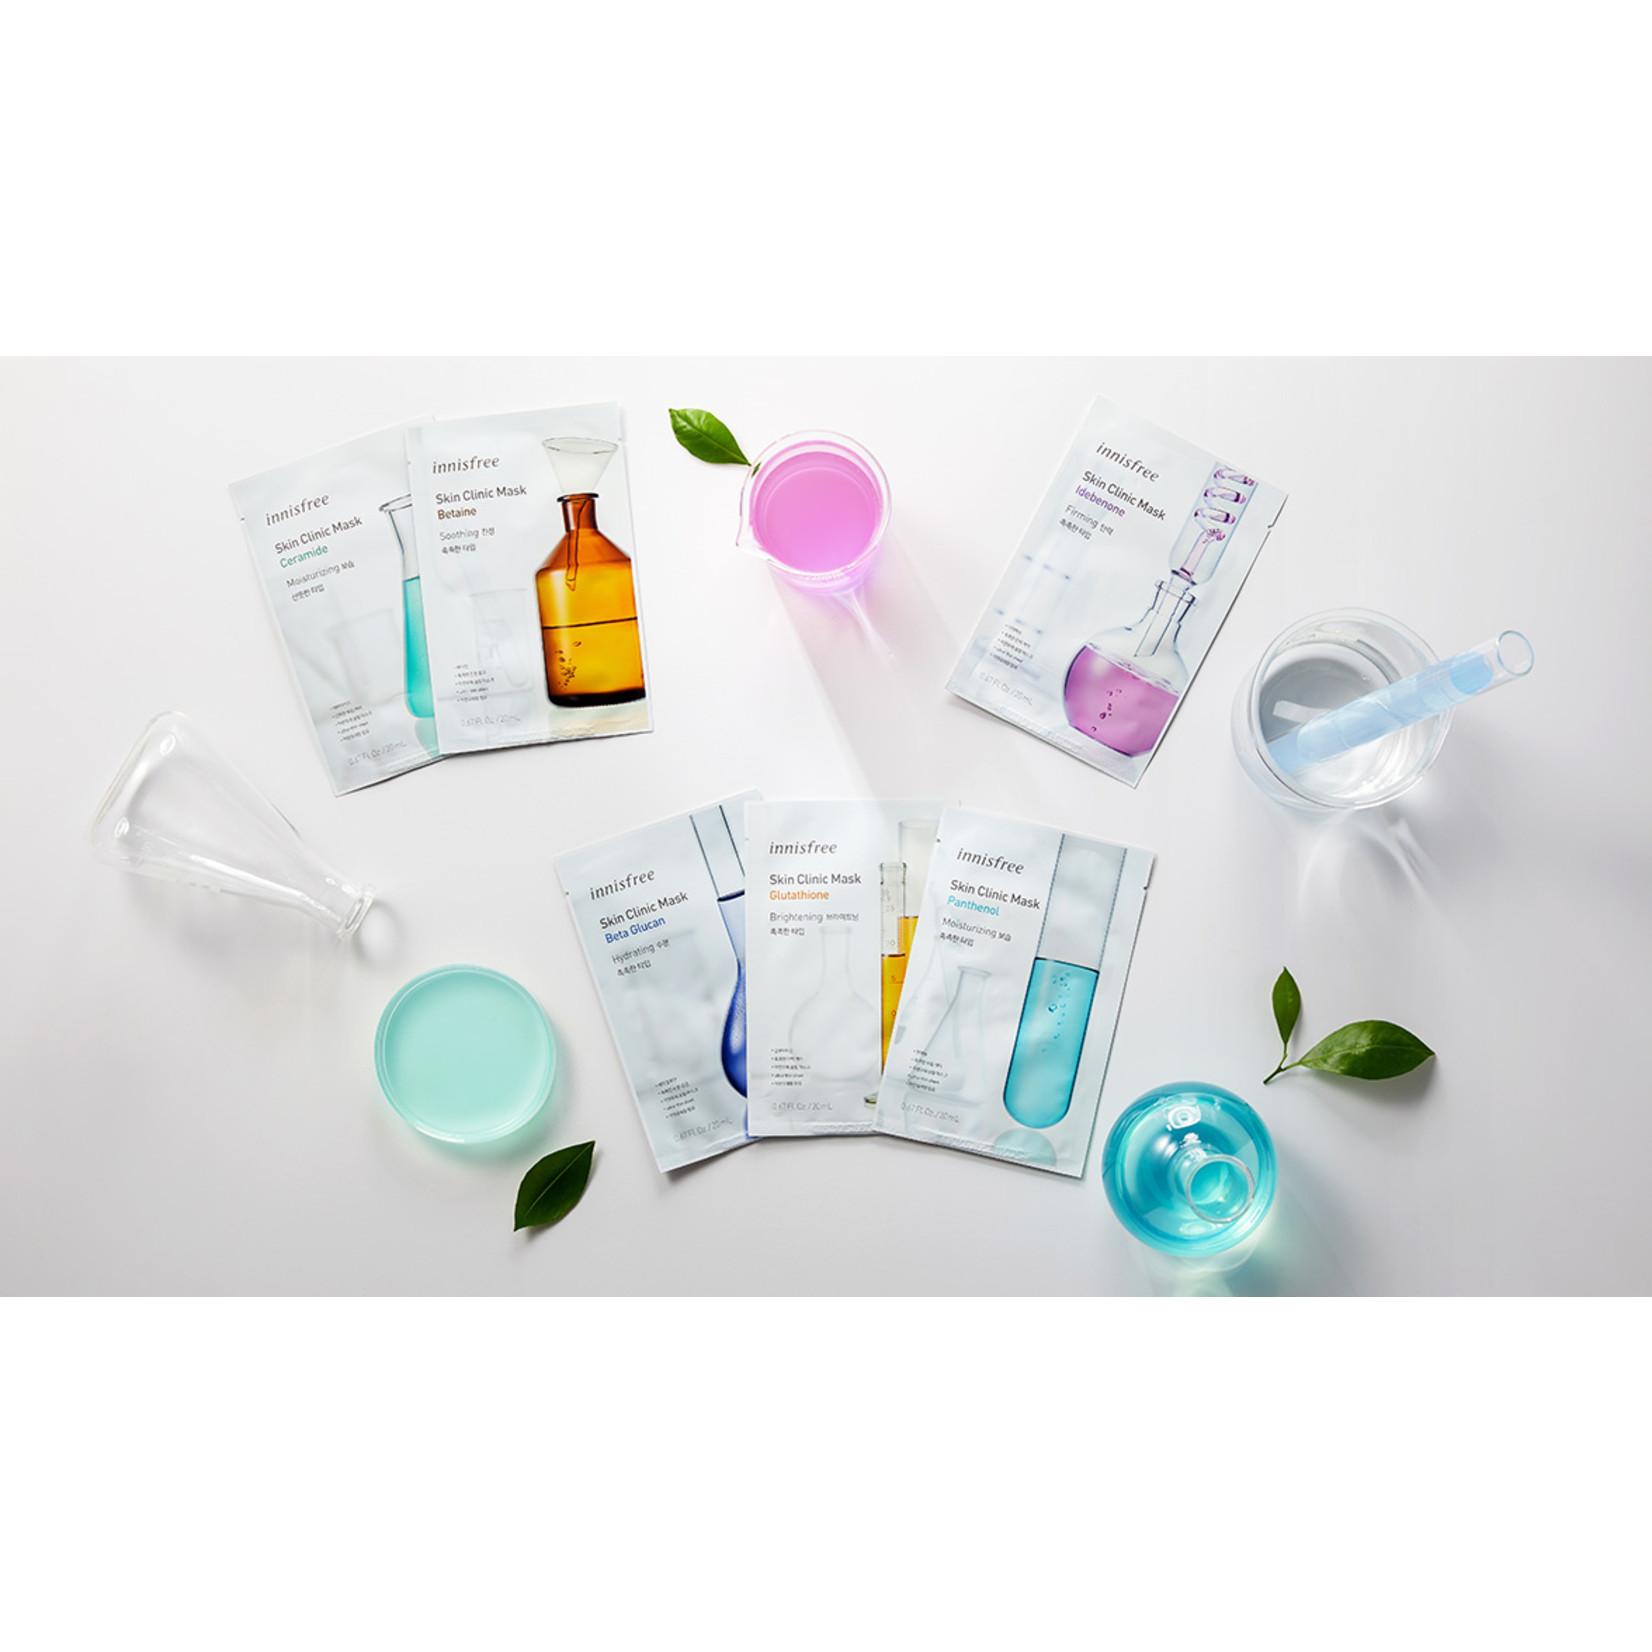 innisfree Skin Clinic Mask Idebenone (Firming)